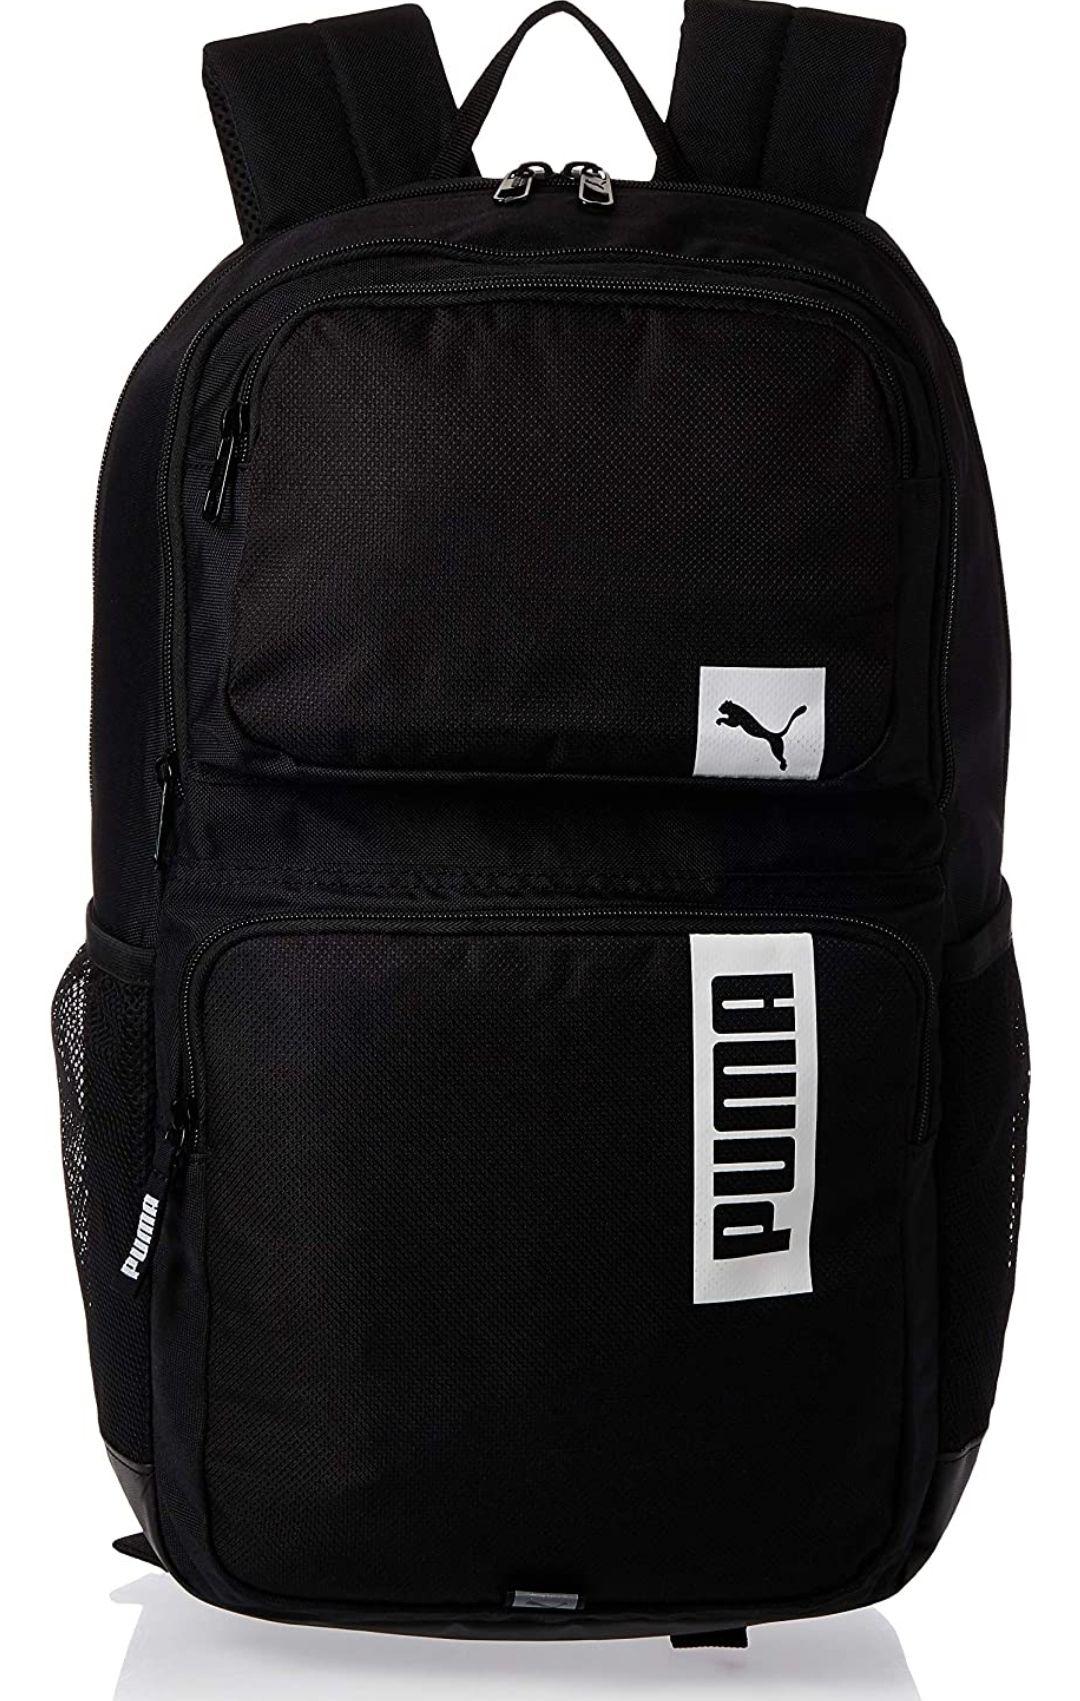 PUMA Deck Backpack II Mochila